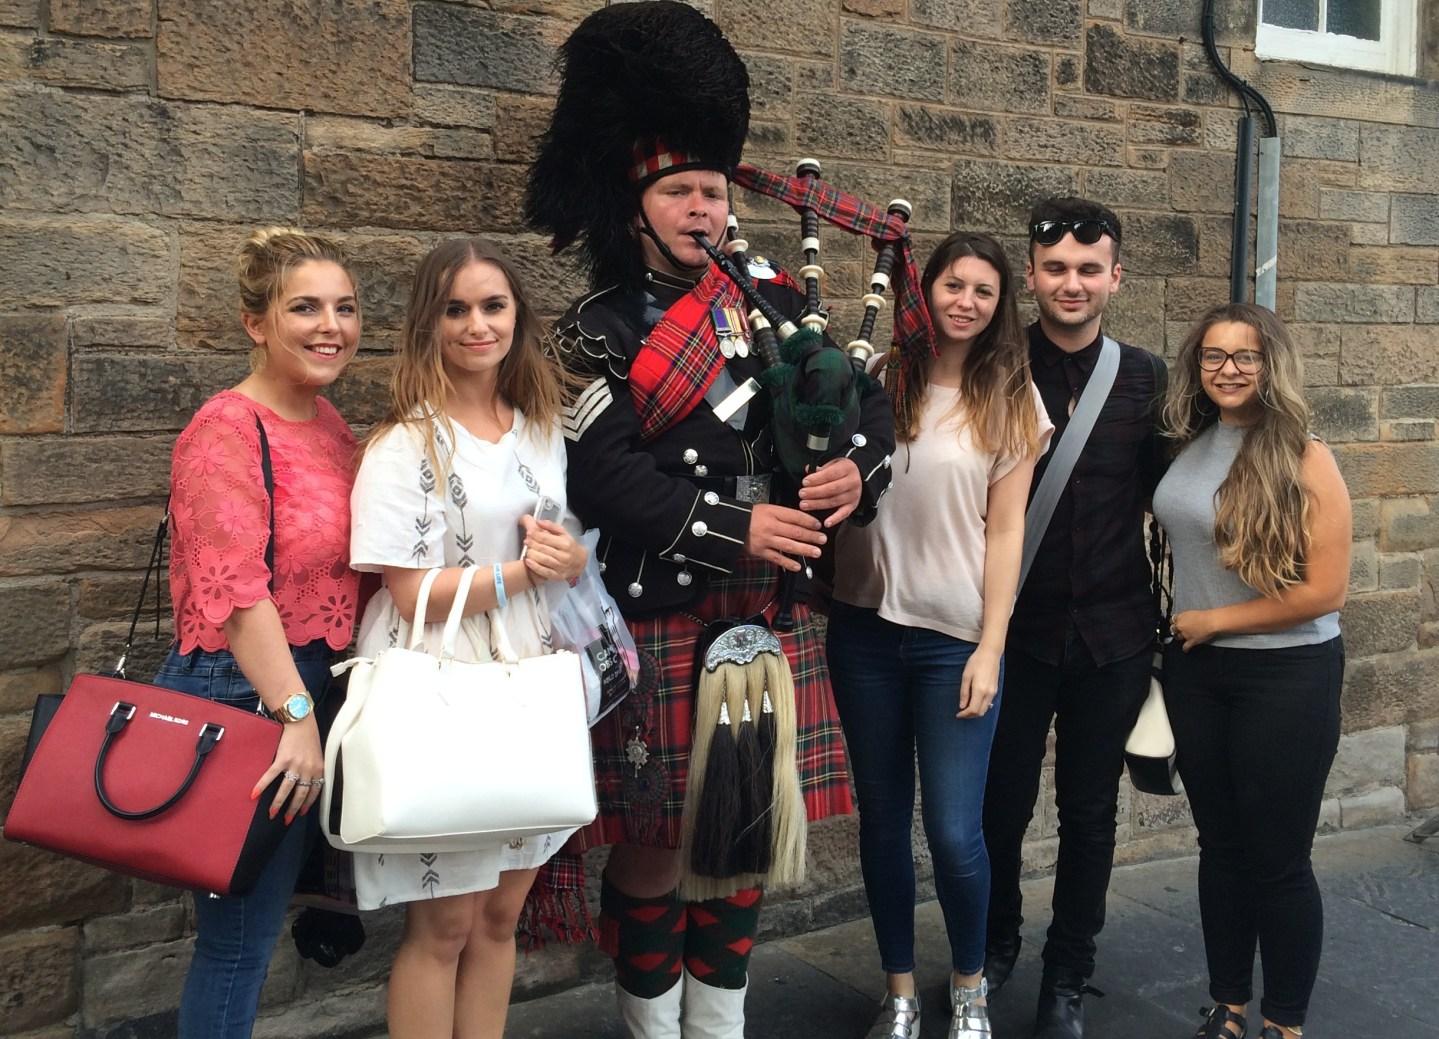 Edinburgh Napier – Day 3